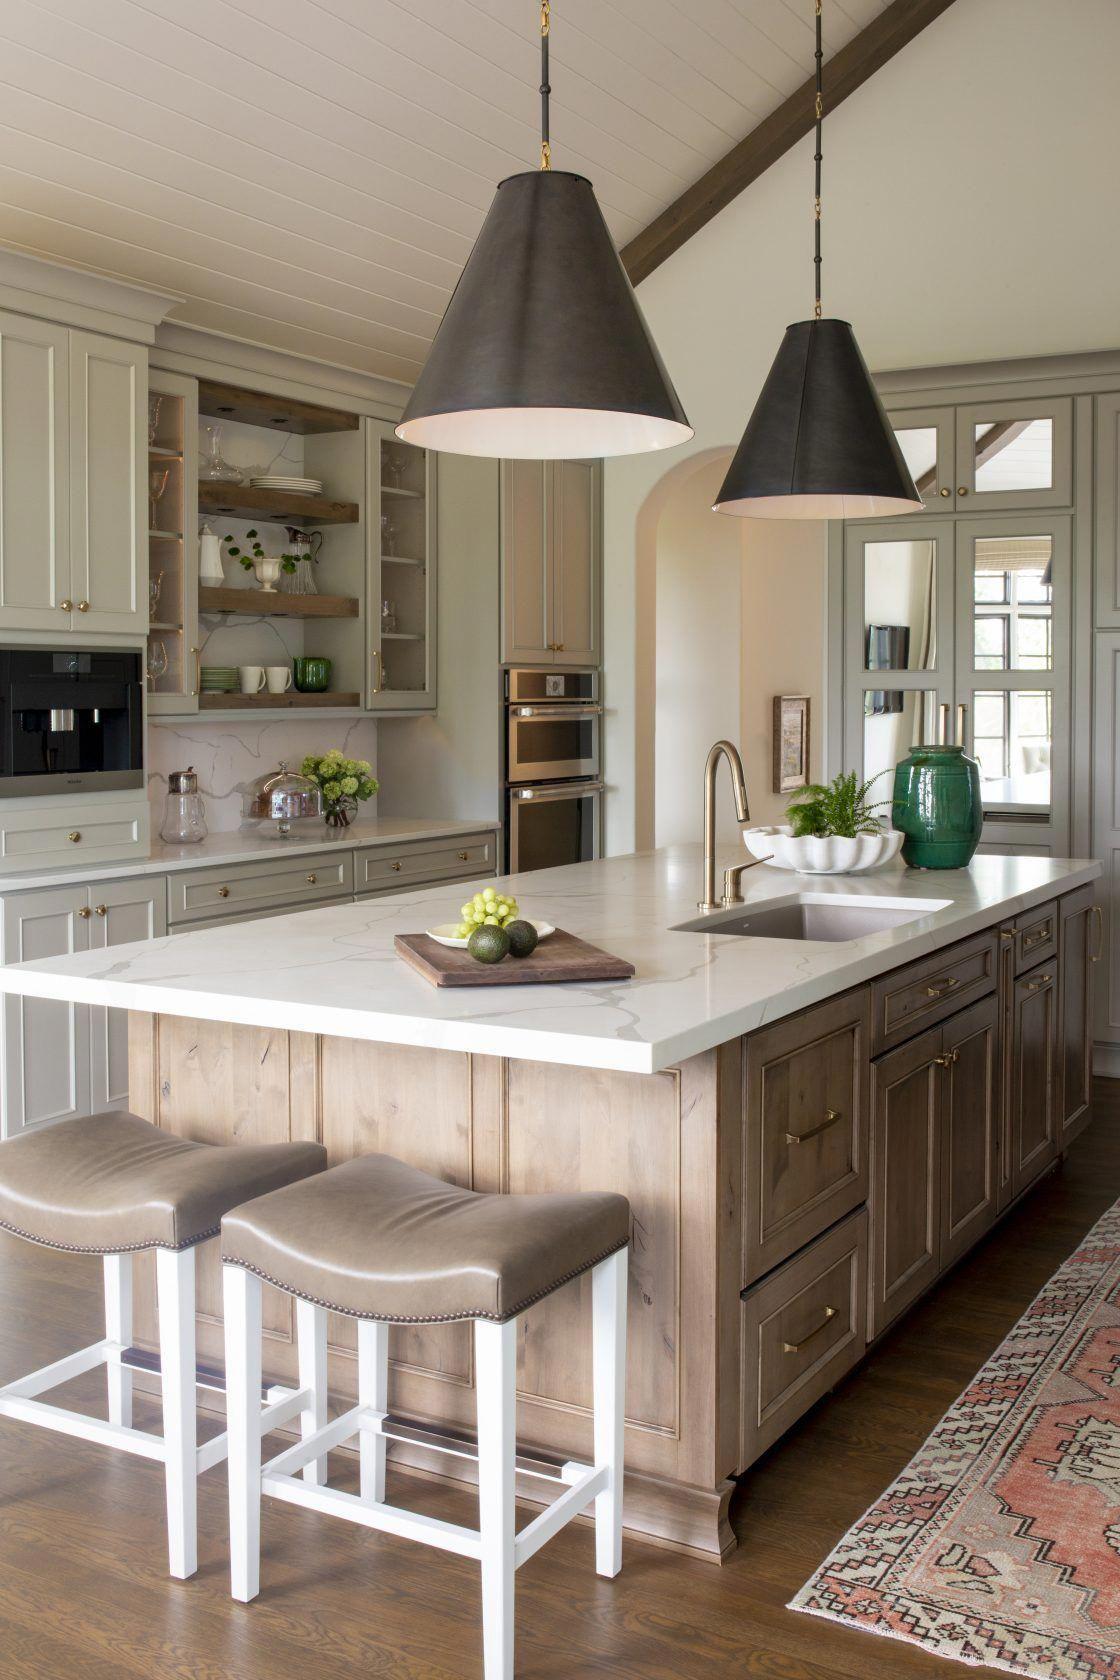 european inspired remodel r cartwright design houseremodeldiy in 2019 farmhouse kitchen on r kitchen cabinets id=18771